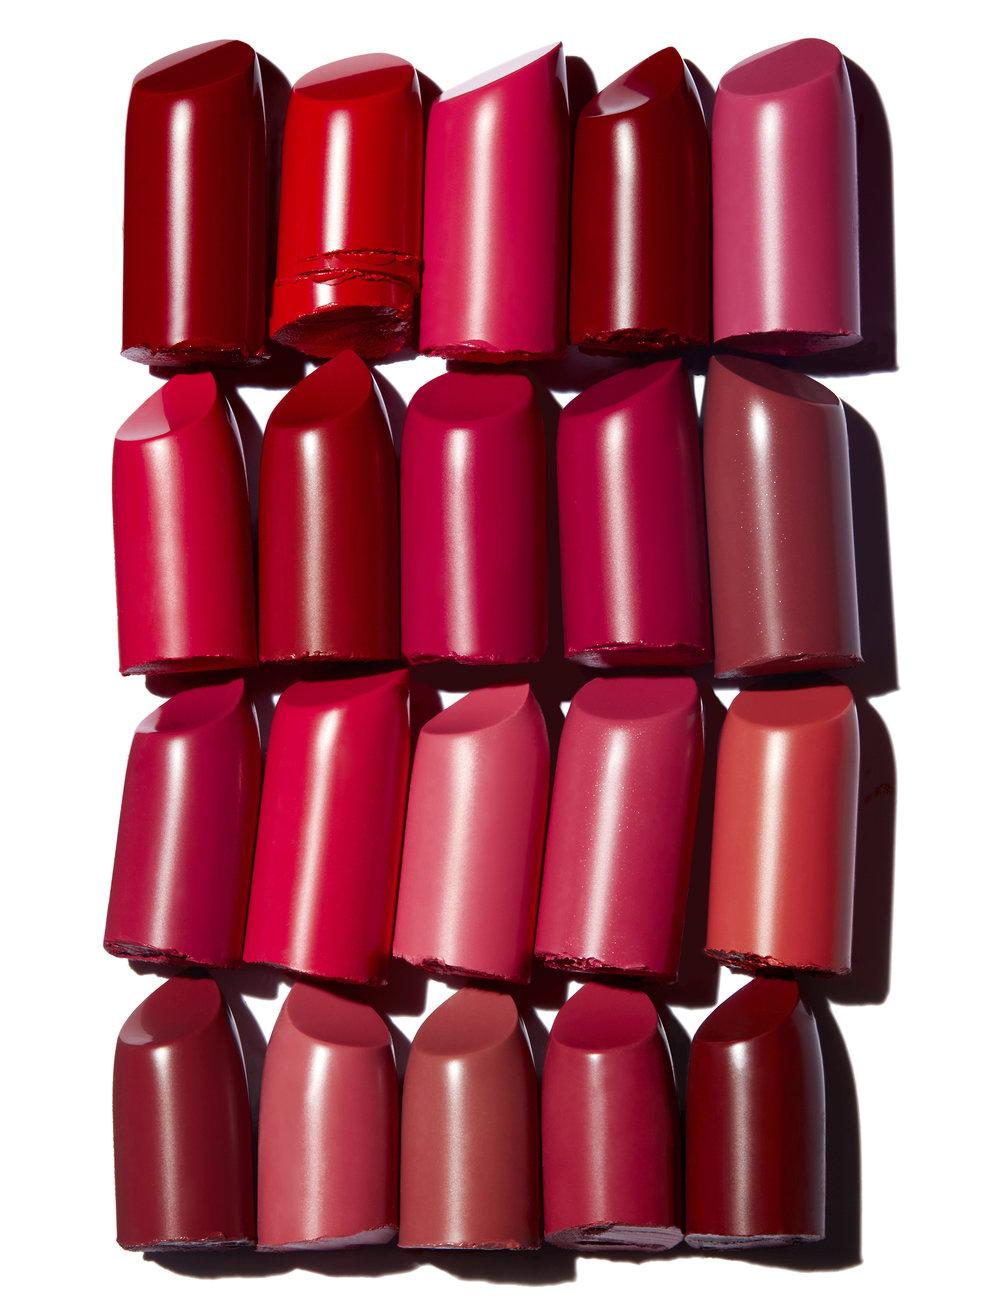 Lipstick Bullets Group